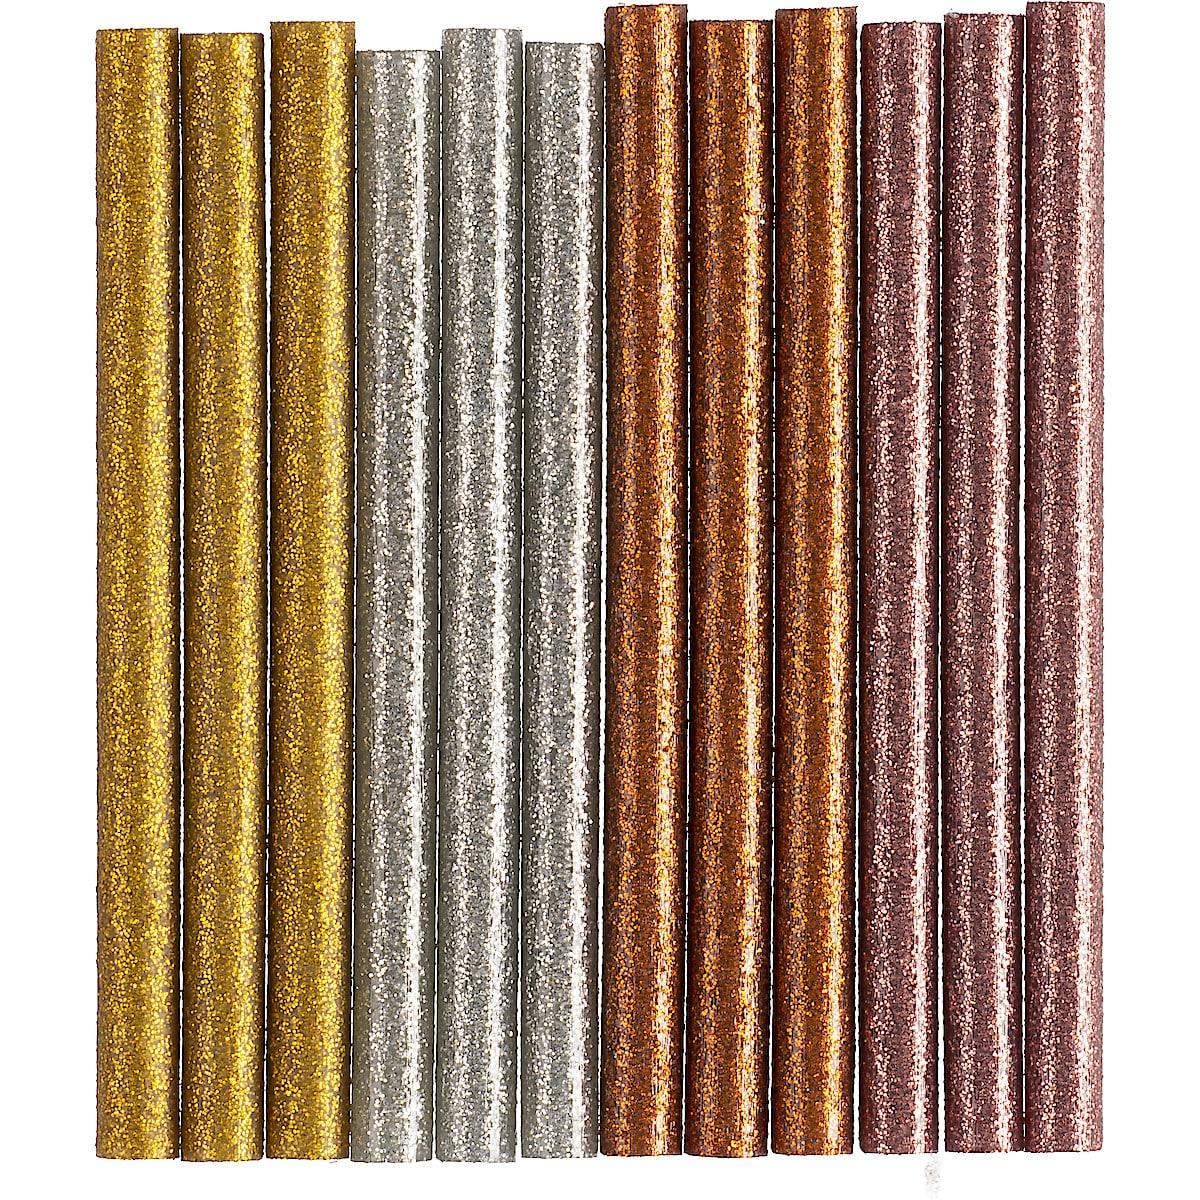 Limpatroner glitter 7 x 100 mm